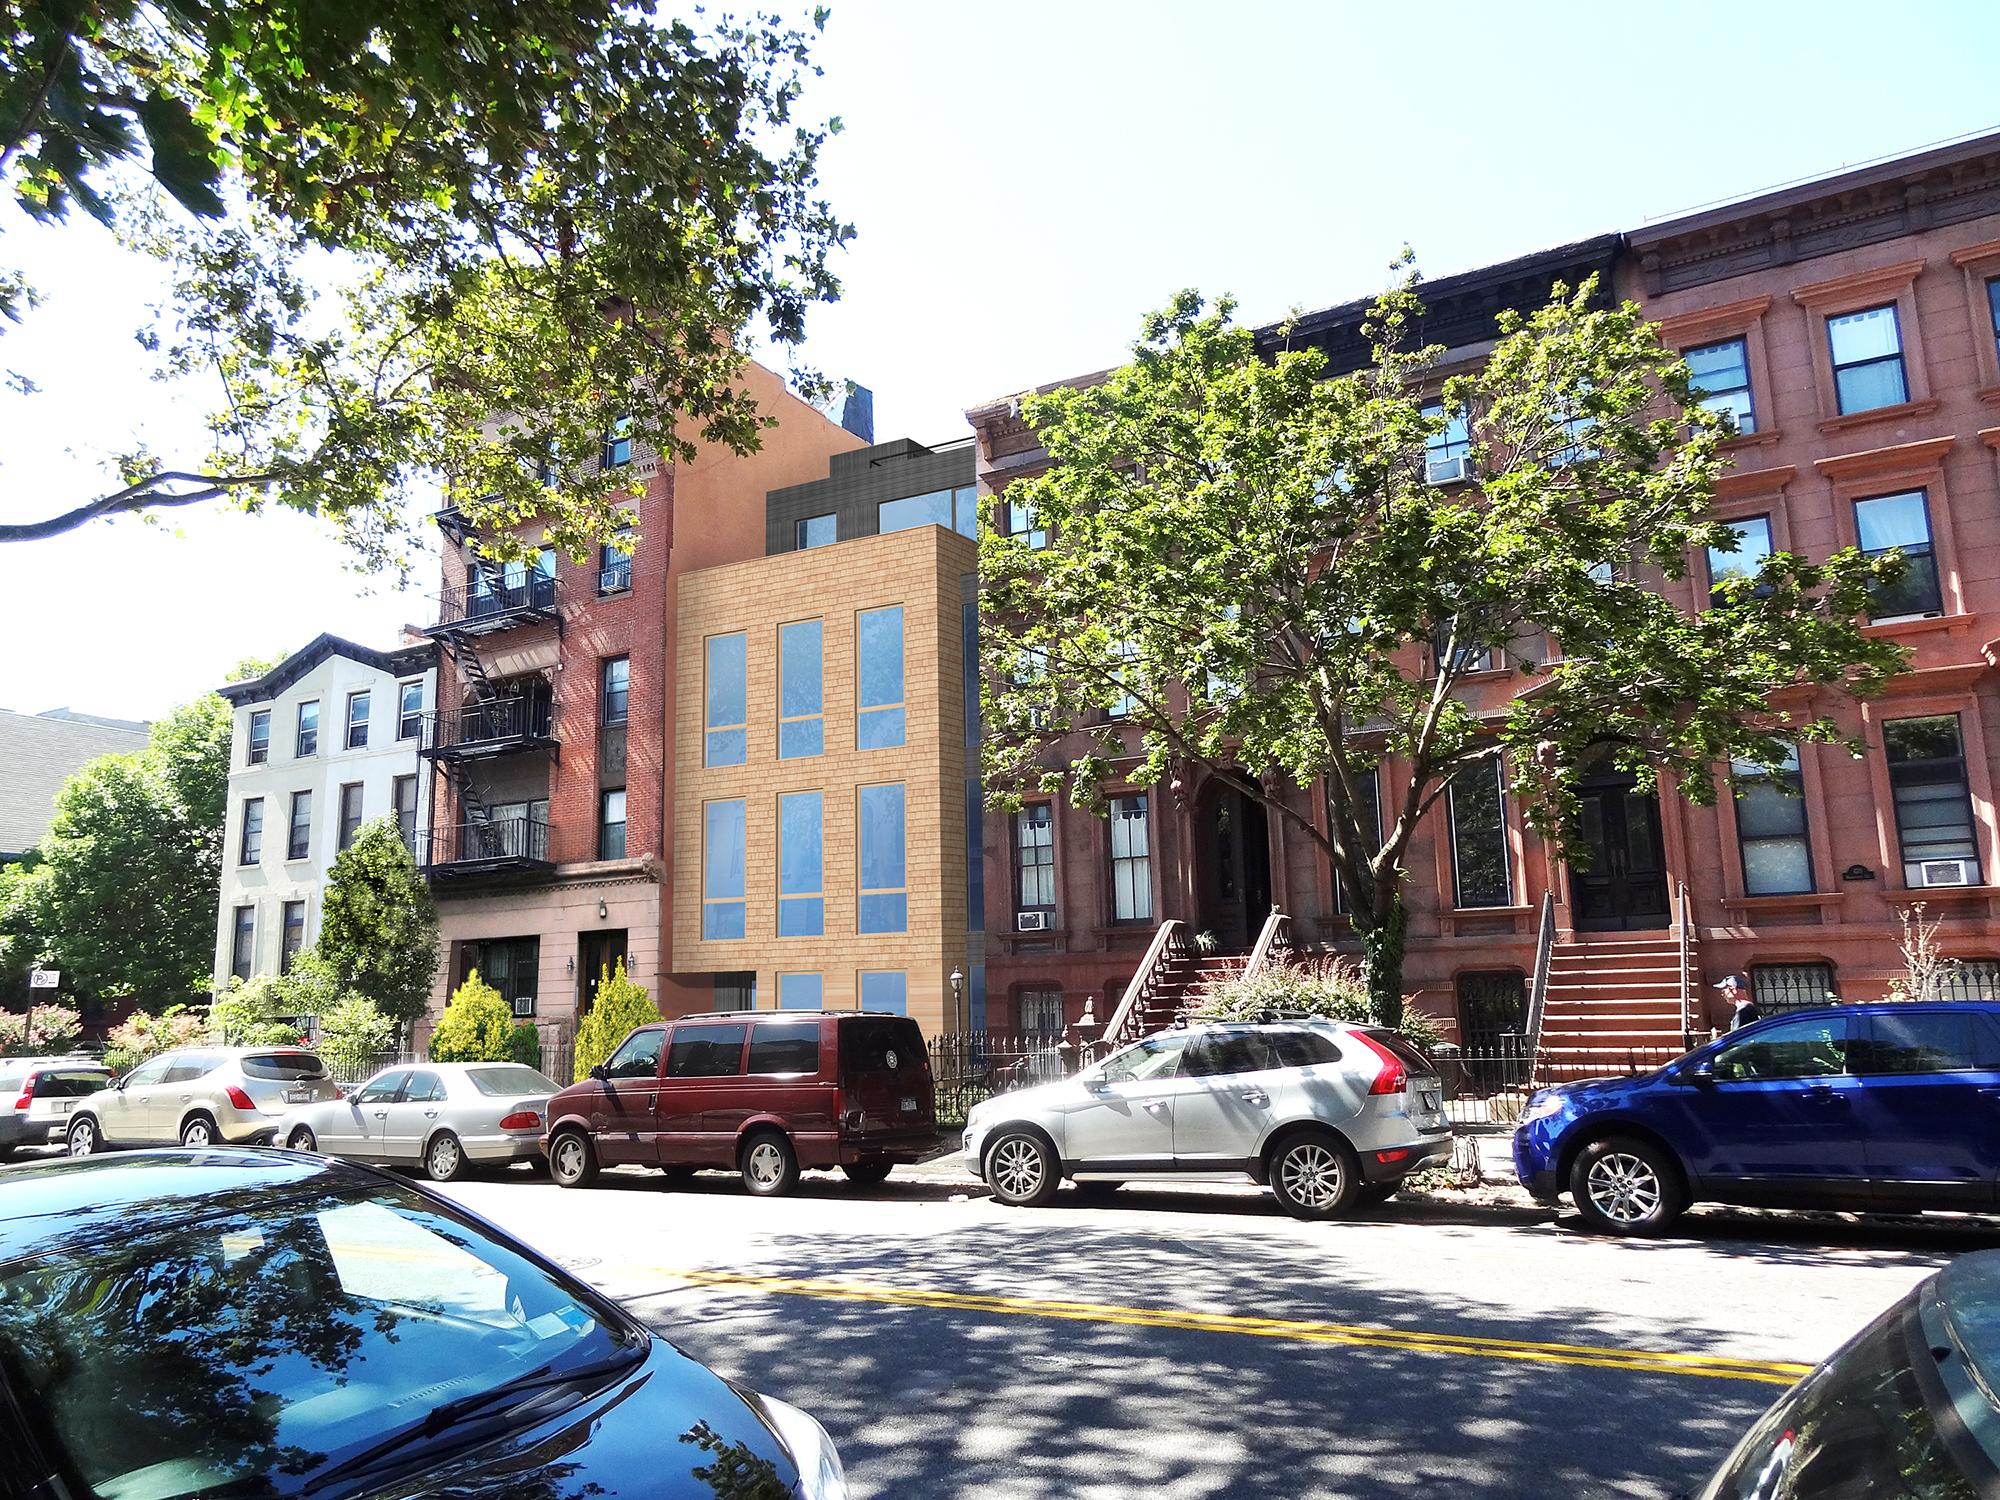 Proposal for 476 Washington Avenue